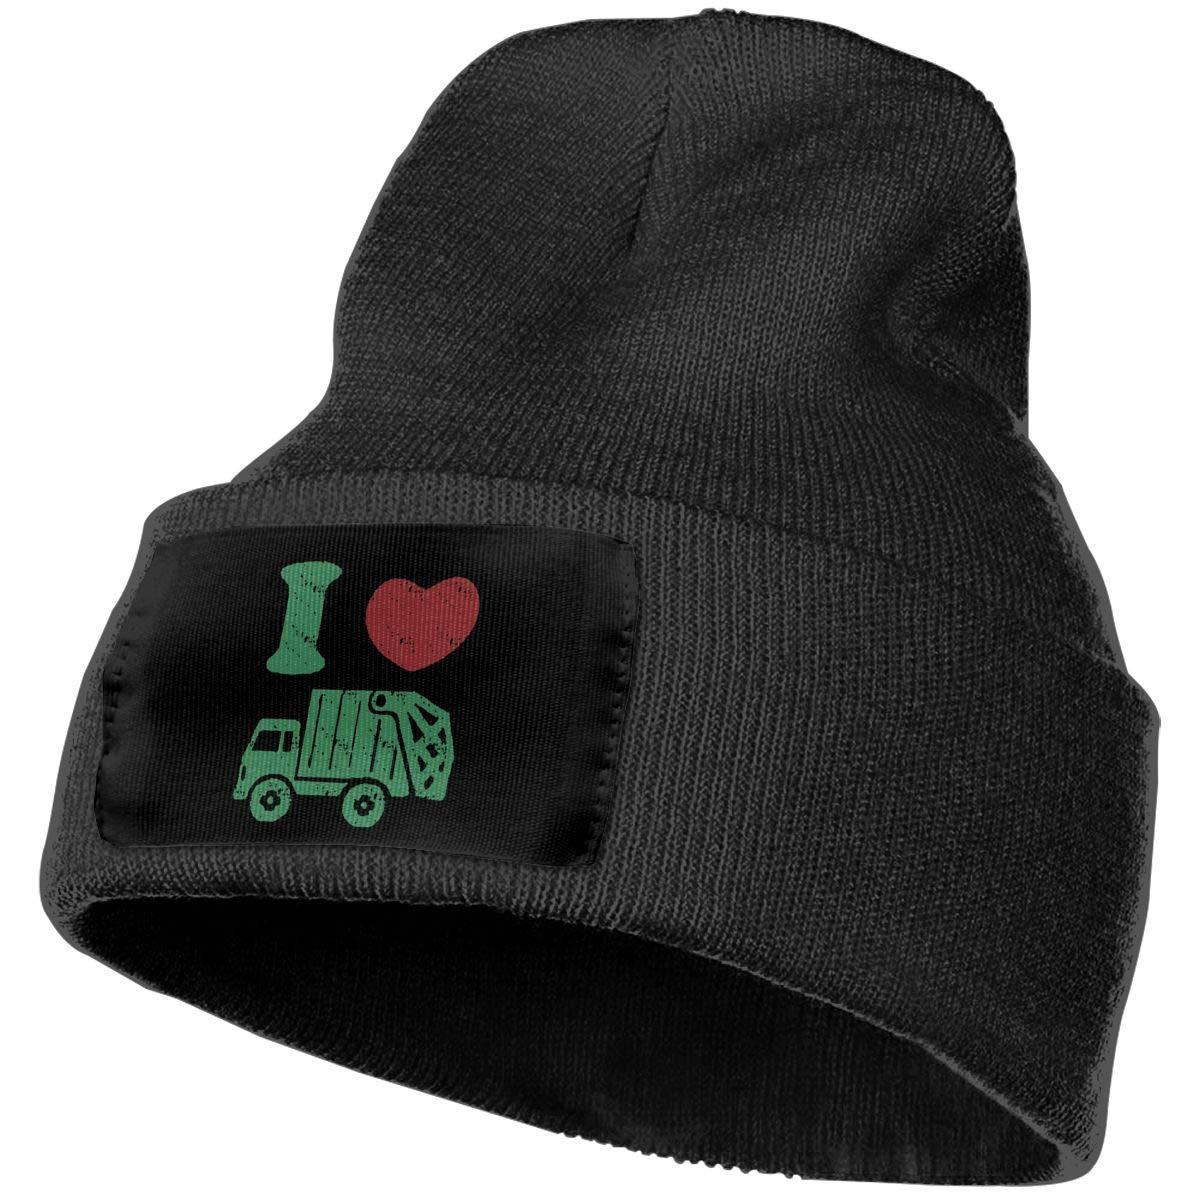 Men /& Women I Love Trash Garbage Trucks Outdoor Warm Knit Beanies Hat Soft Winter Skull Caps